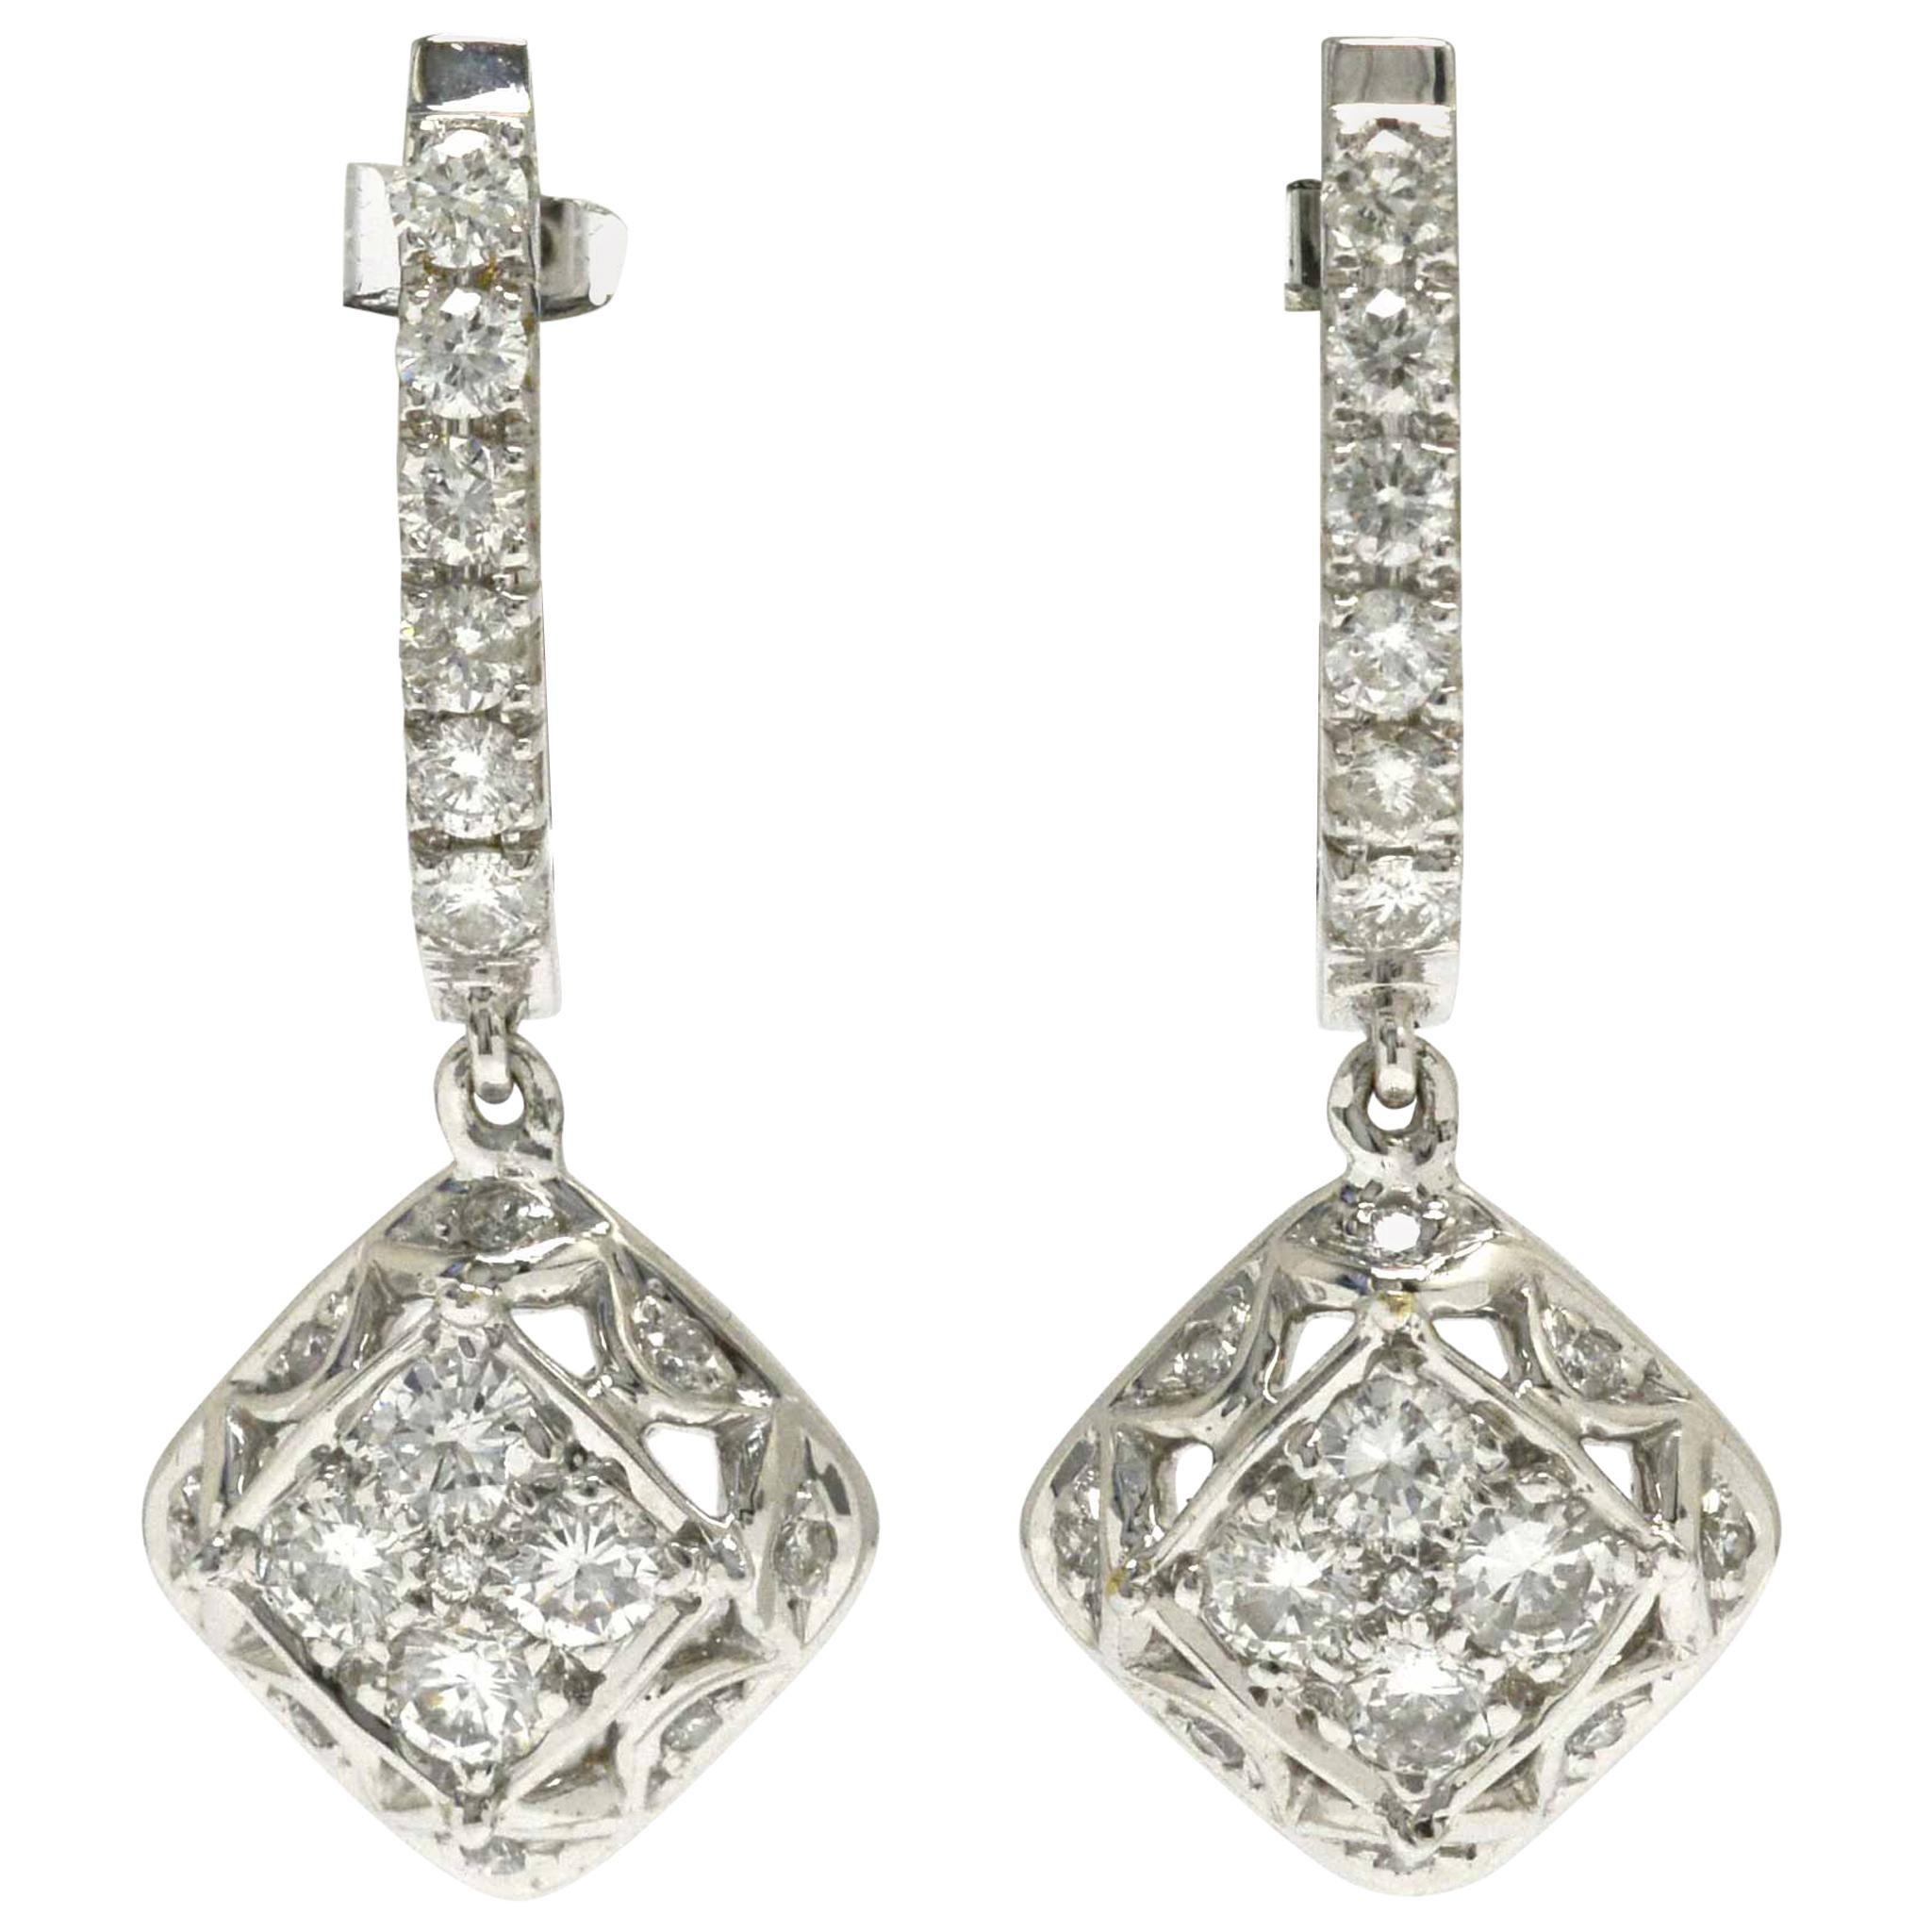 Dazzling Diamond Dangle Earrings Drop Style Estate 18 Karat Gold Over 1 Carat